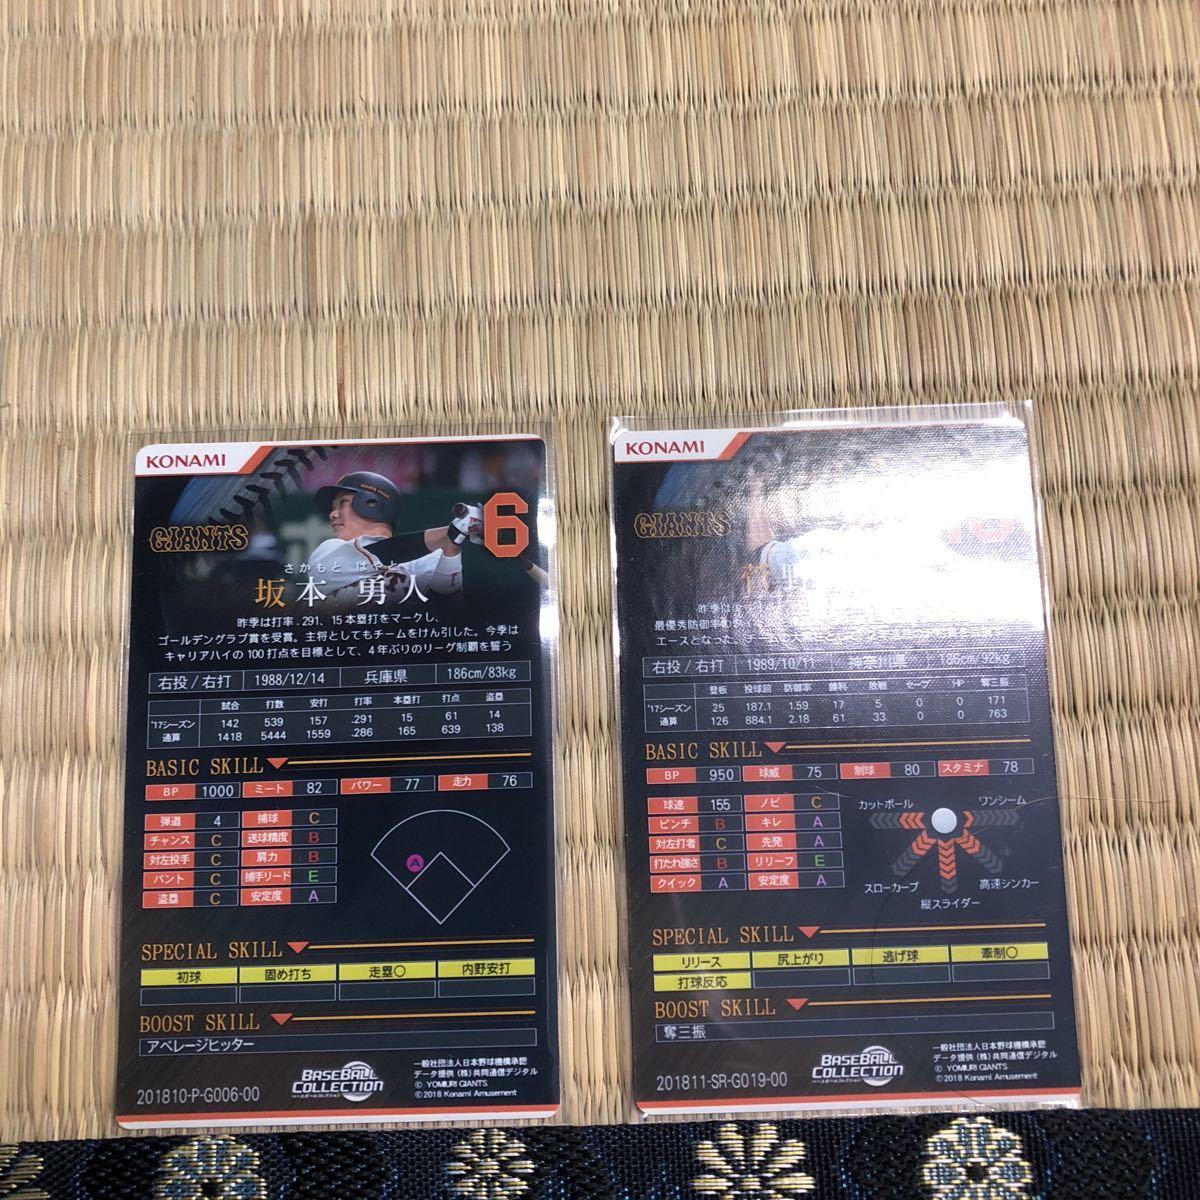 BBC ベースボールコレクション プレミアム 坂本勇人 SR 菅野智之 1セット_画像2